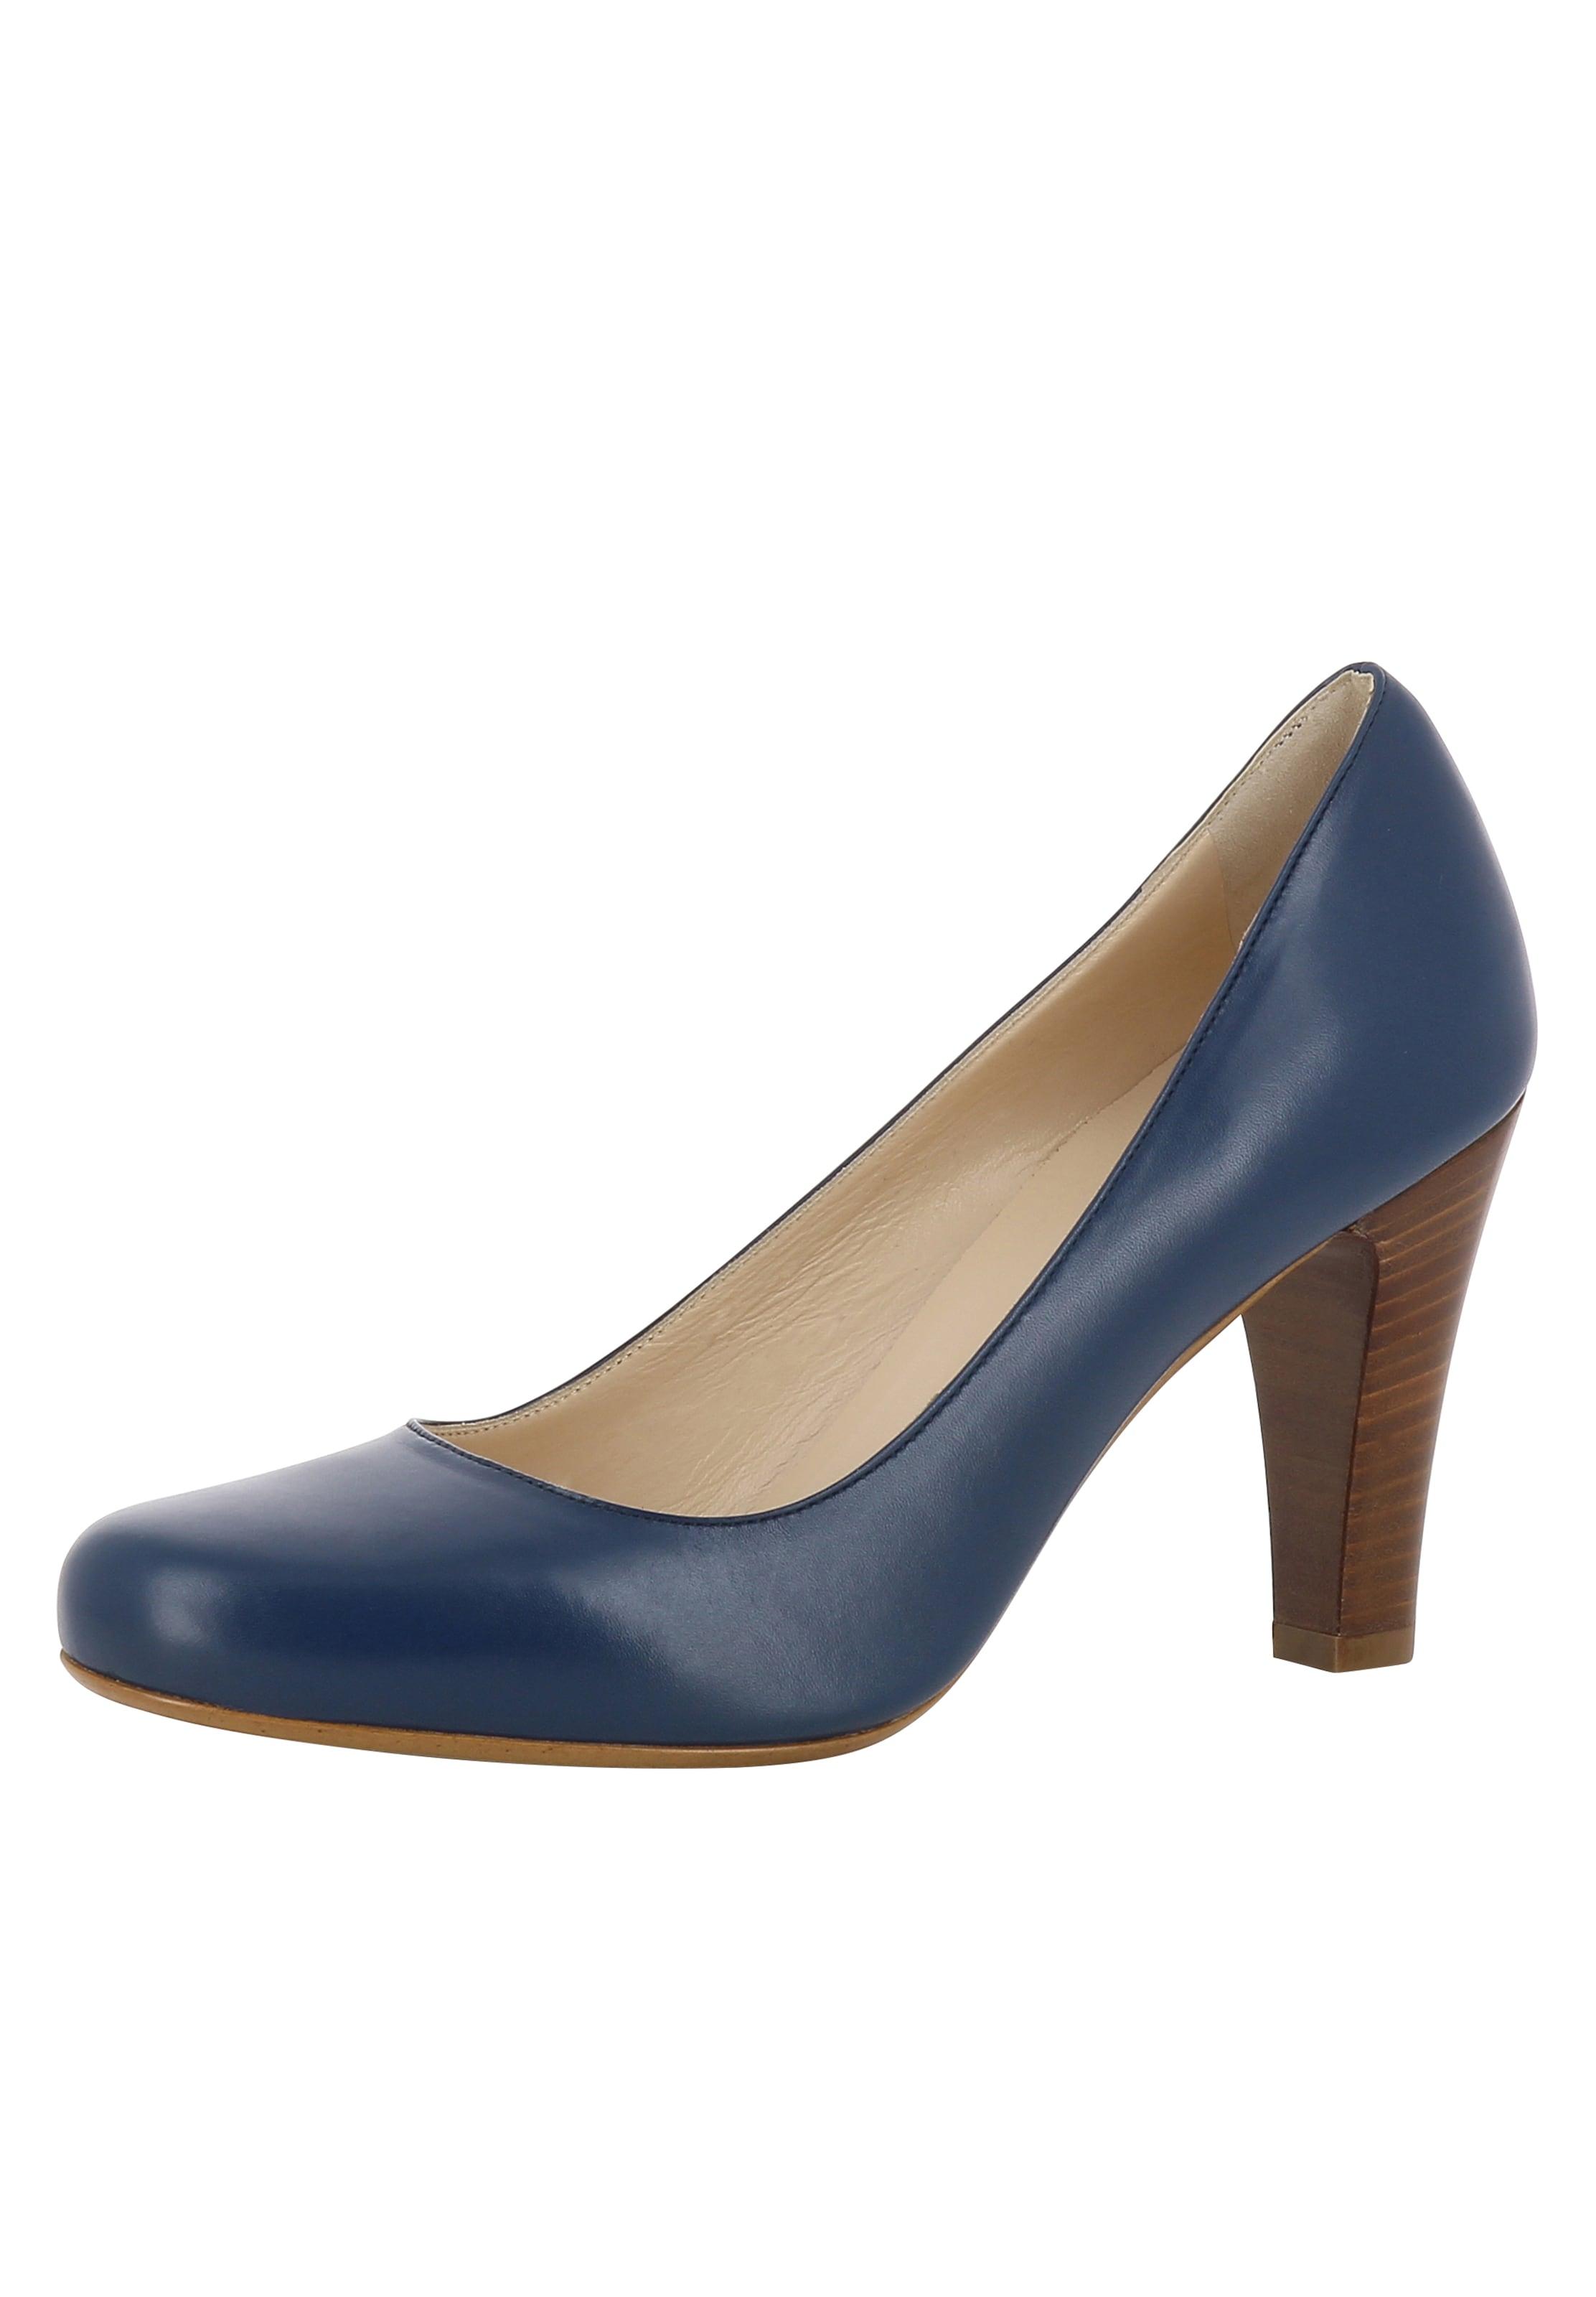 Haltbare Mode billige Schuhe EVITA | Pumps 'MARIA' Schuhe Gut getragene Schuhe